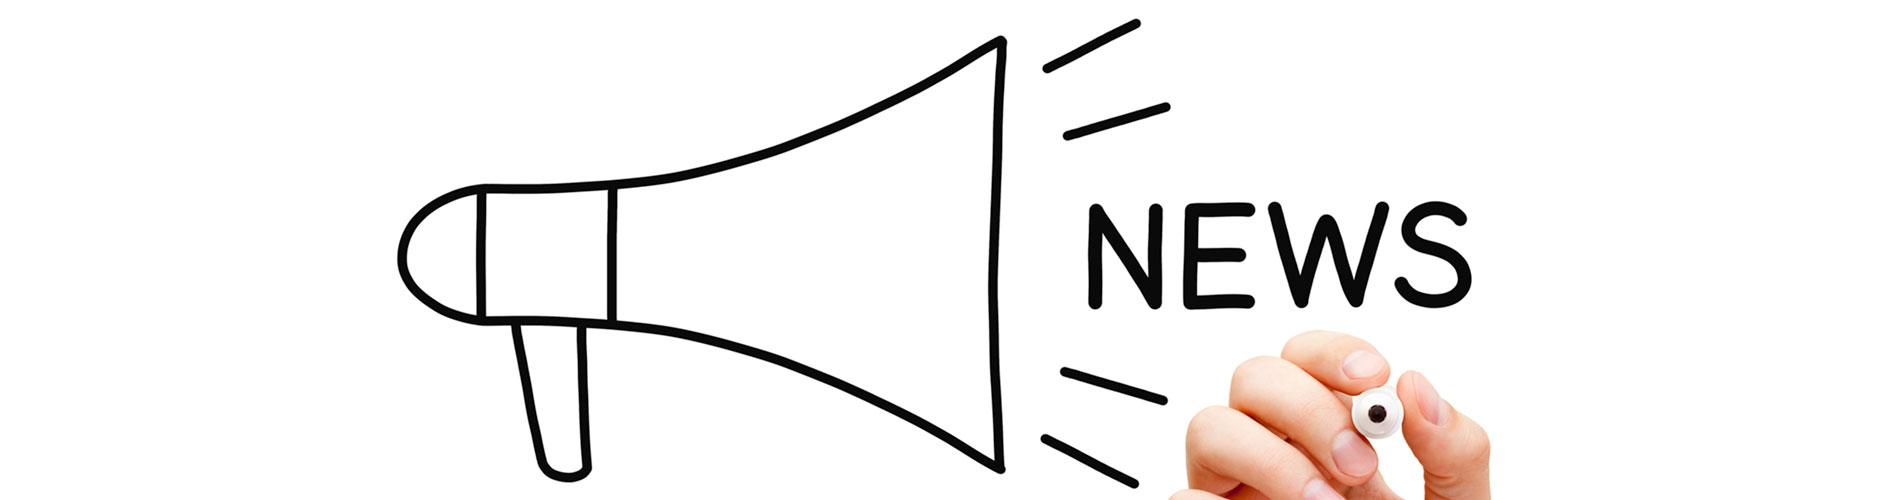 KITCAT News Software fuer Betriebskueche Gemeinschaftsverpfleger Catering